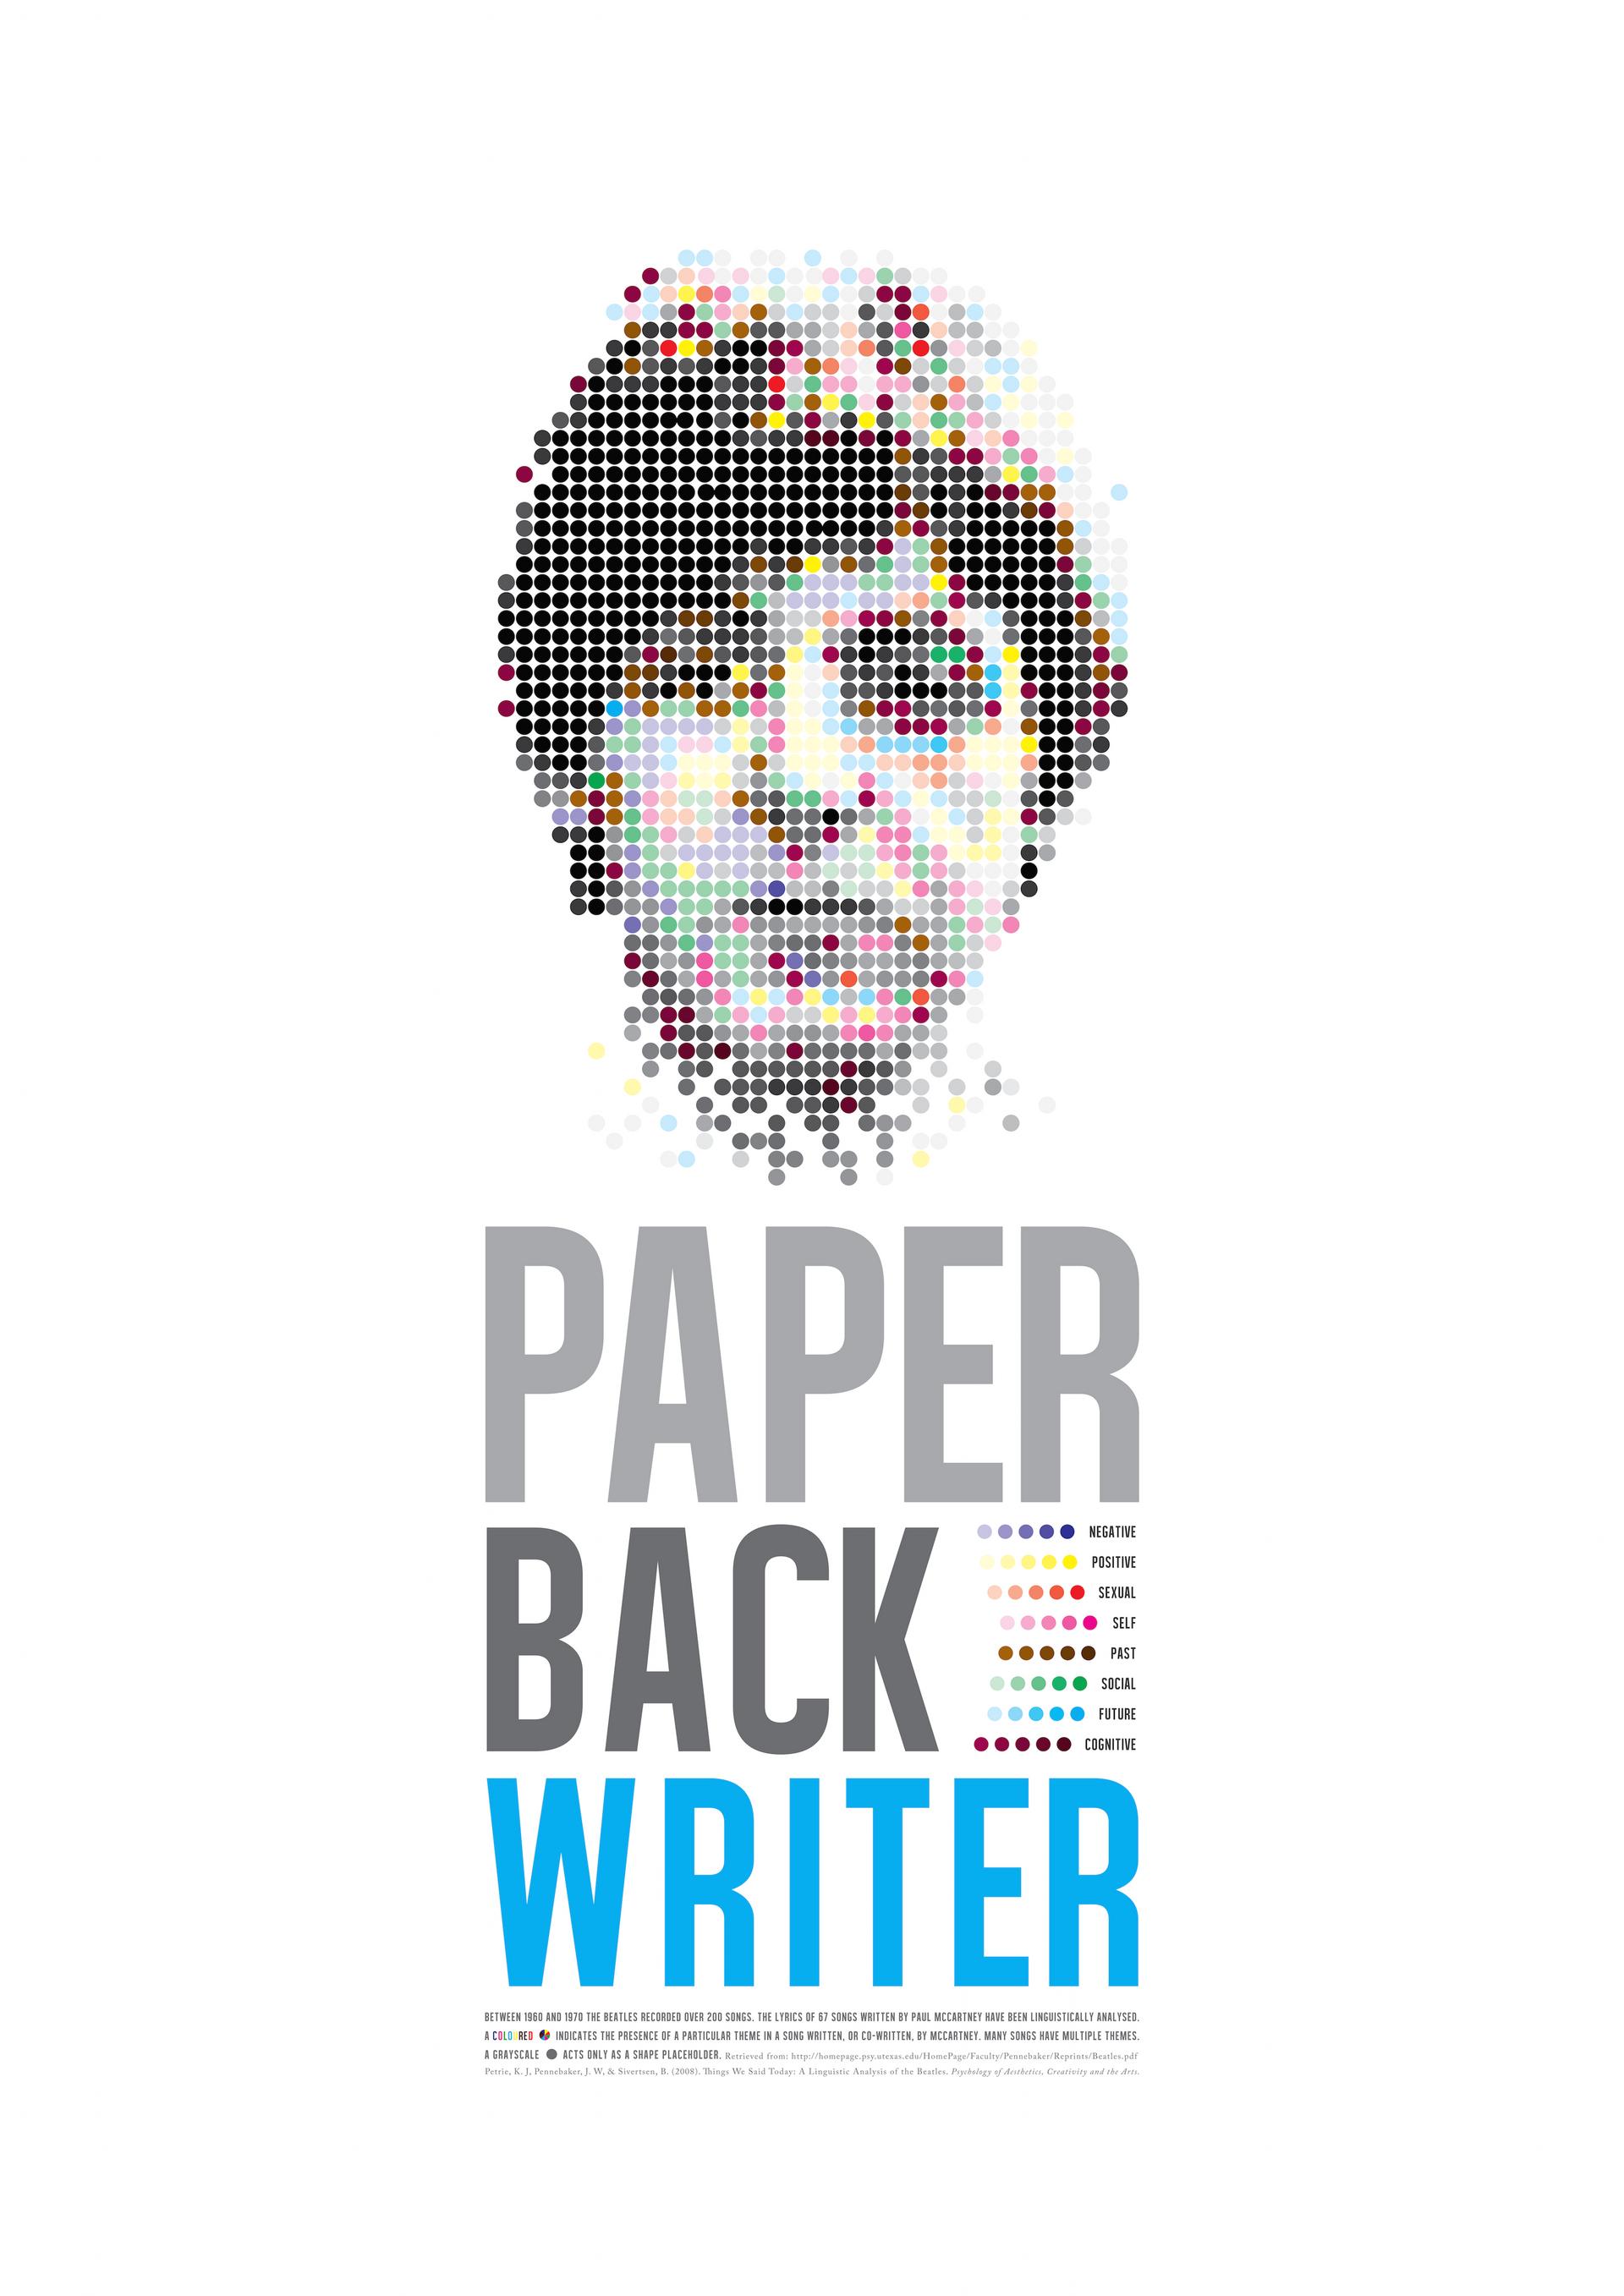 Paper back writer